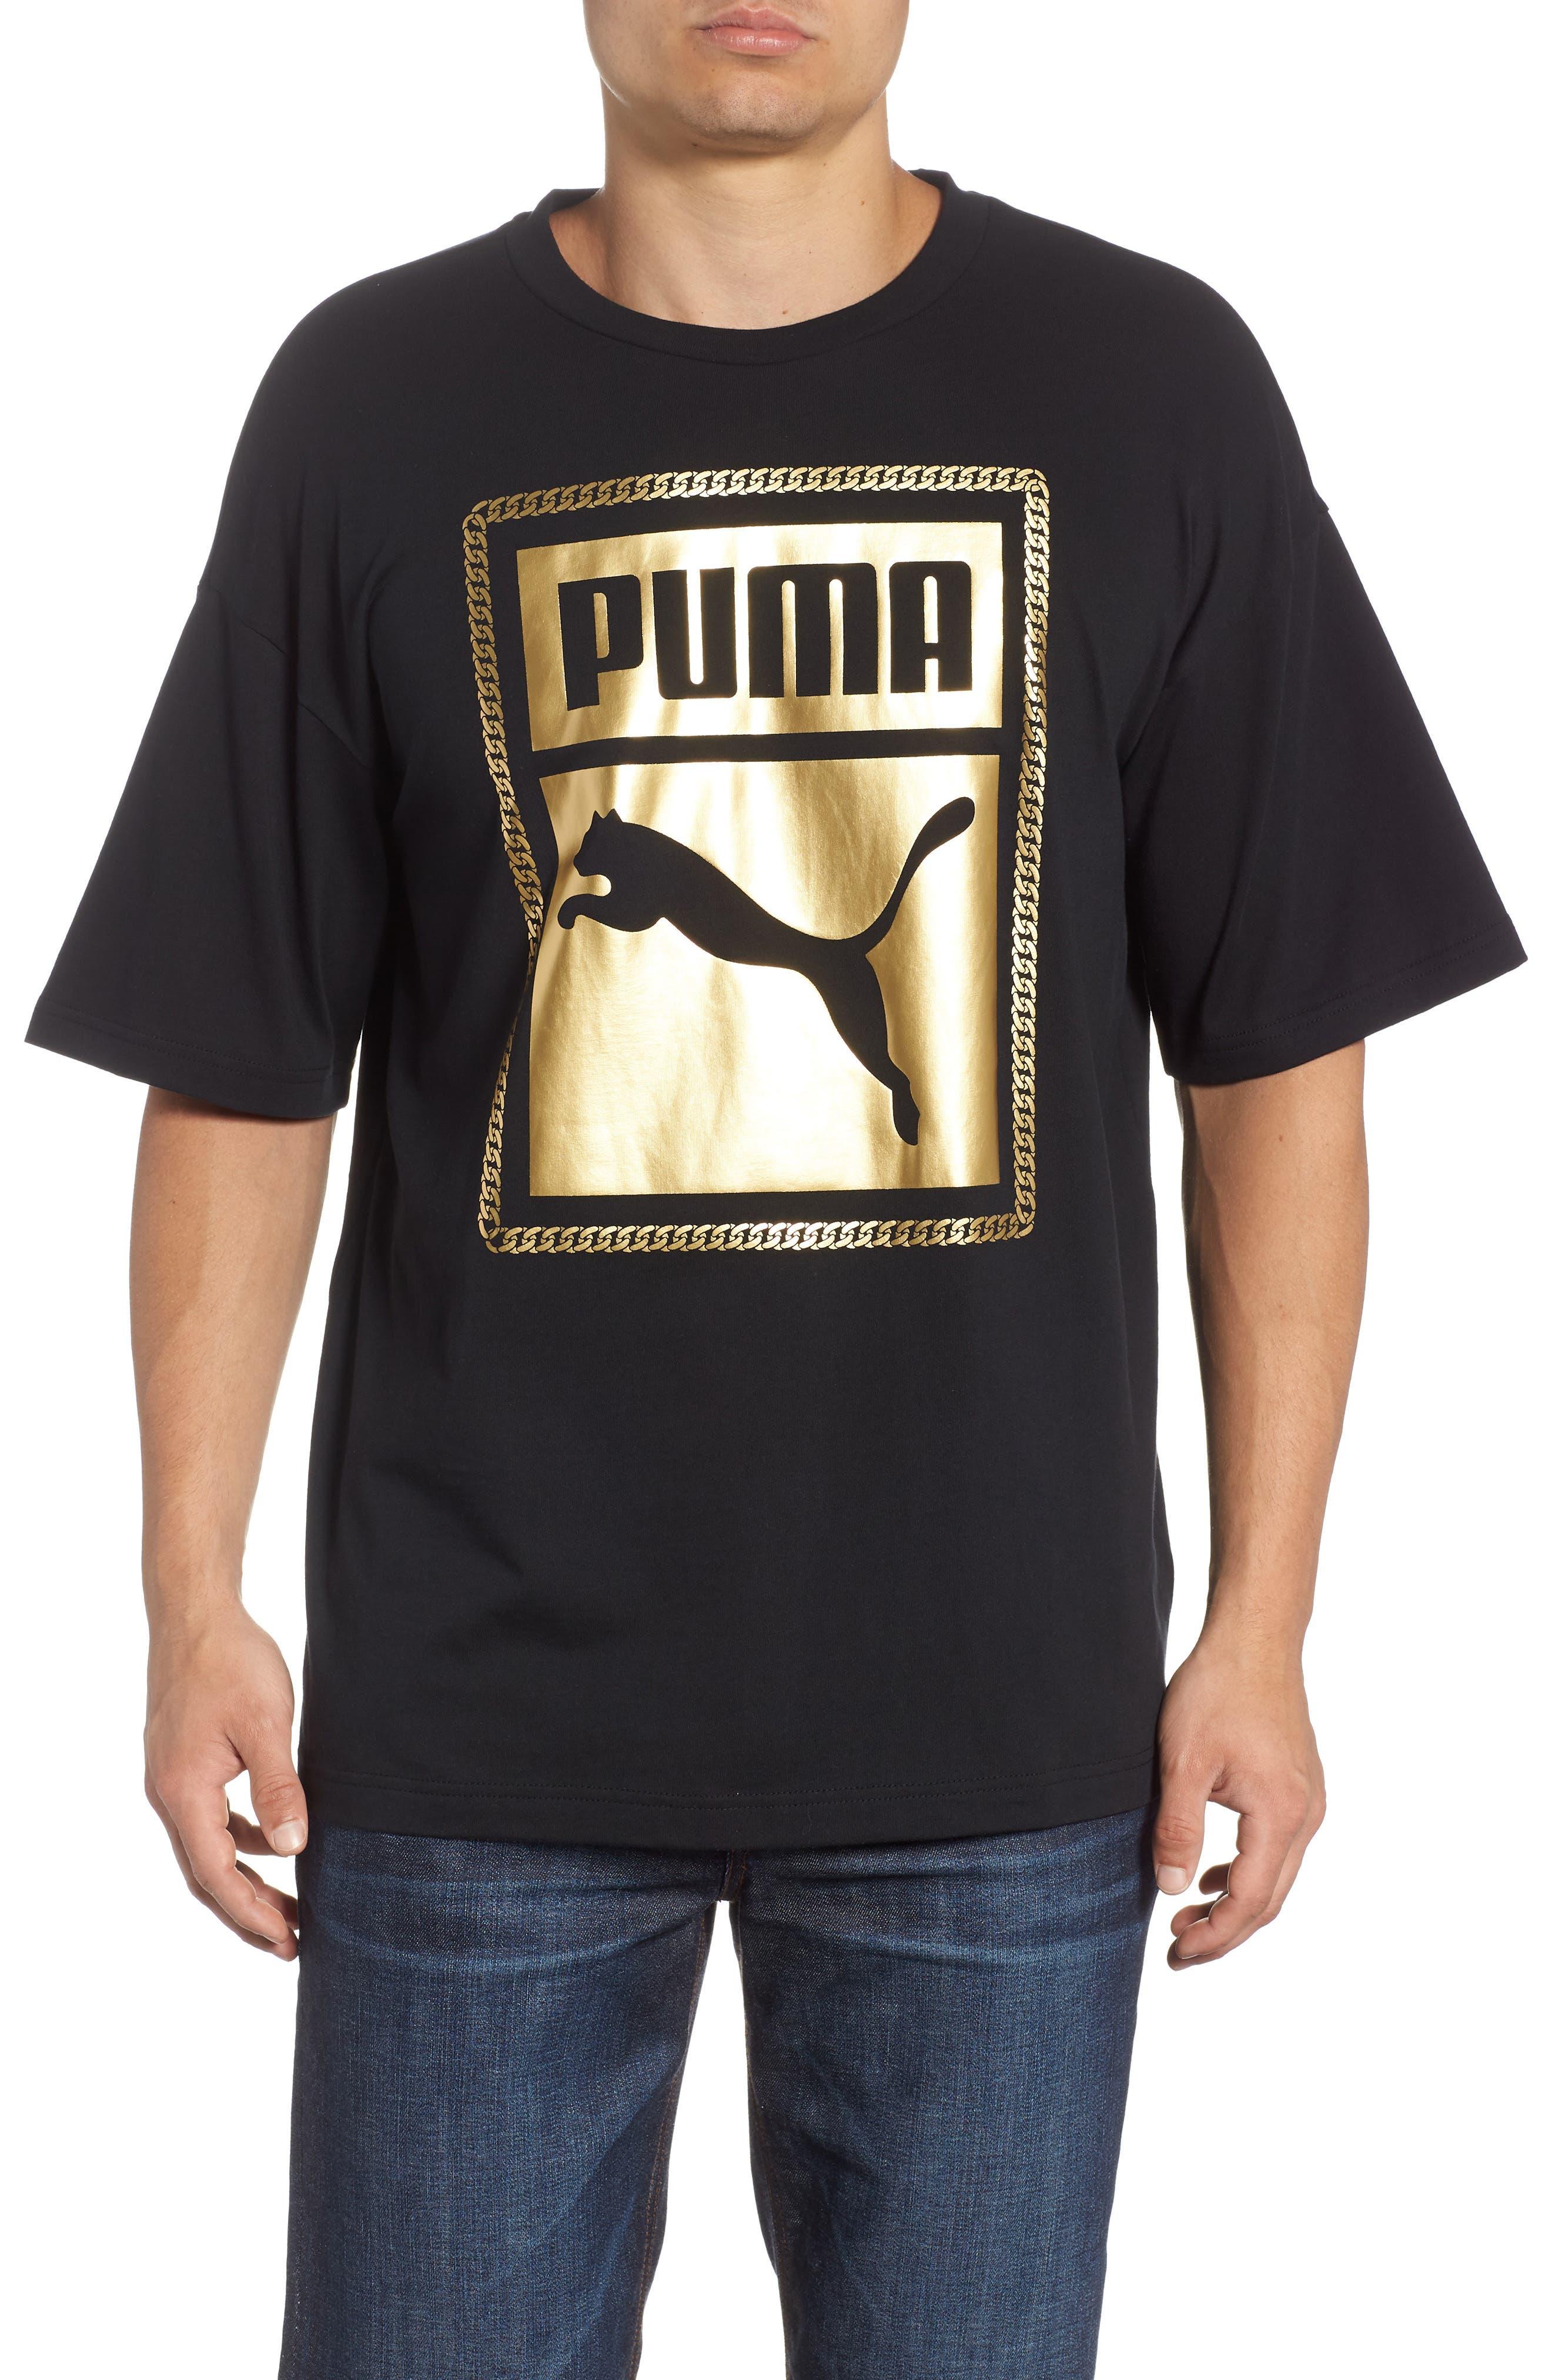 Chains T-Shirt,                             Main thumbnail 1, color,                             Puma Black/ Gold